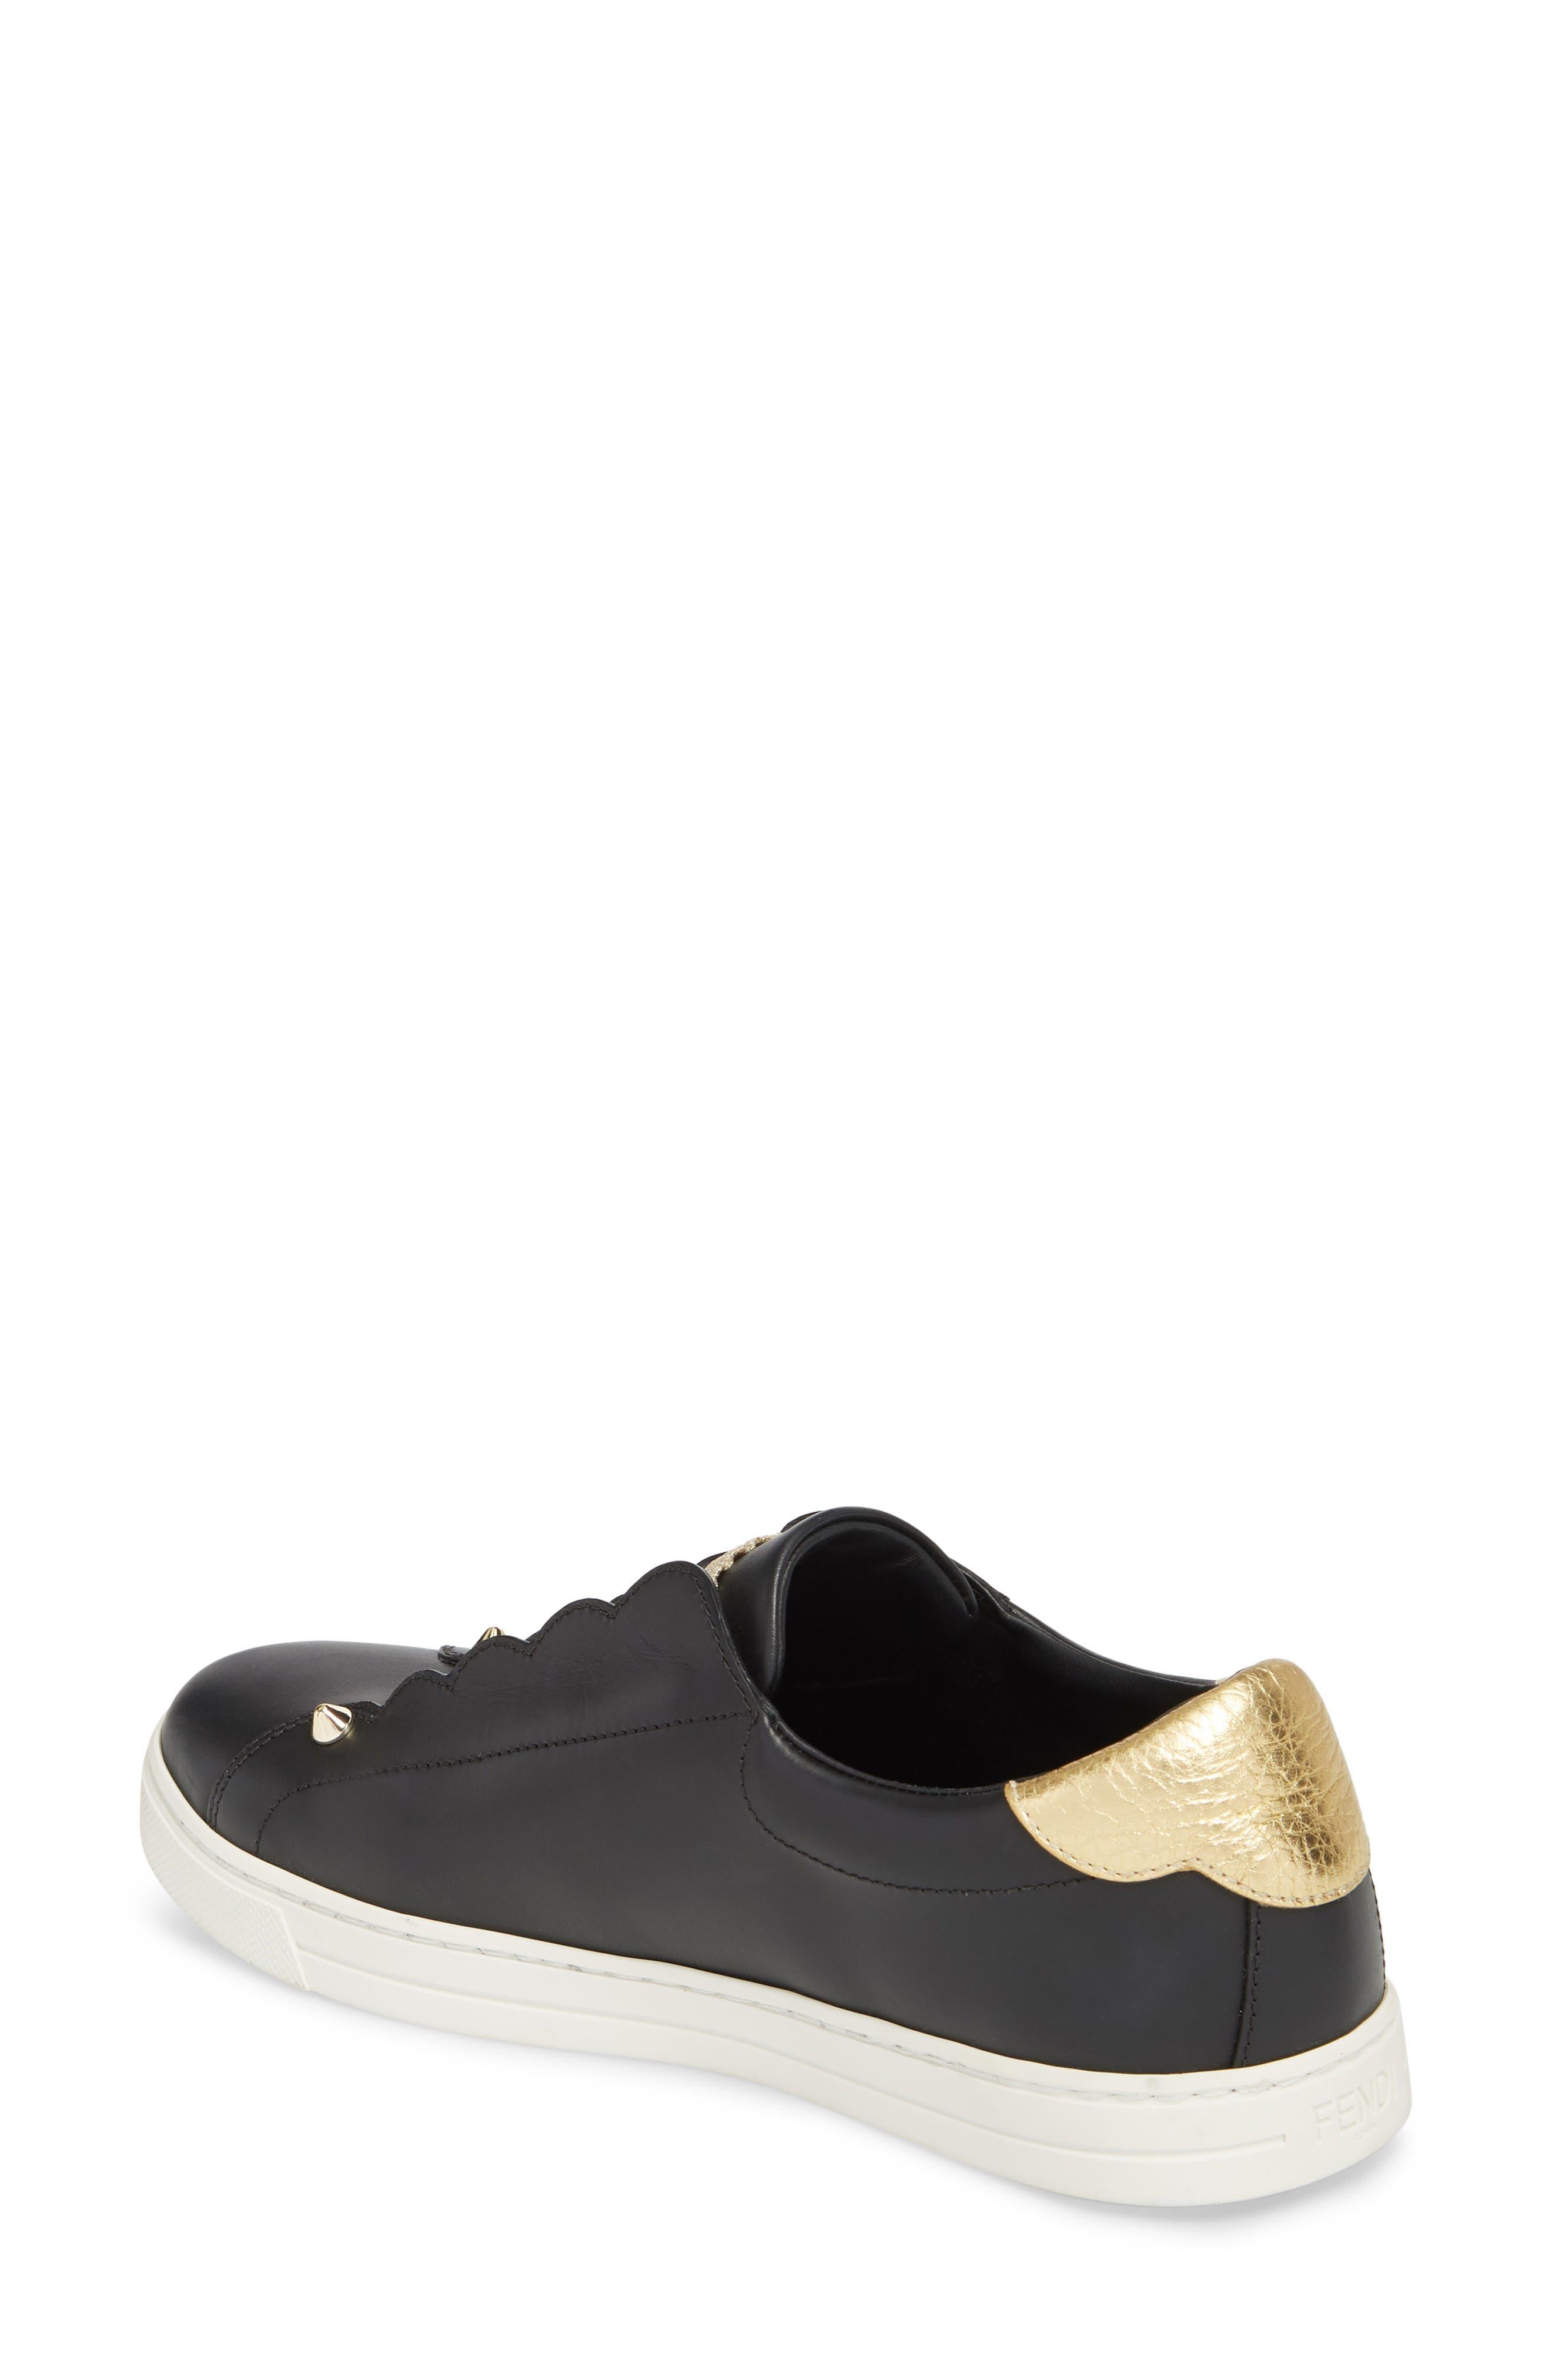 Rockono Slip-On Sneaker,                             Alternate thumbnail 2, color,                             Black